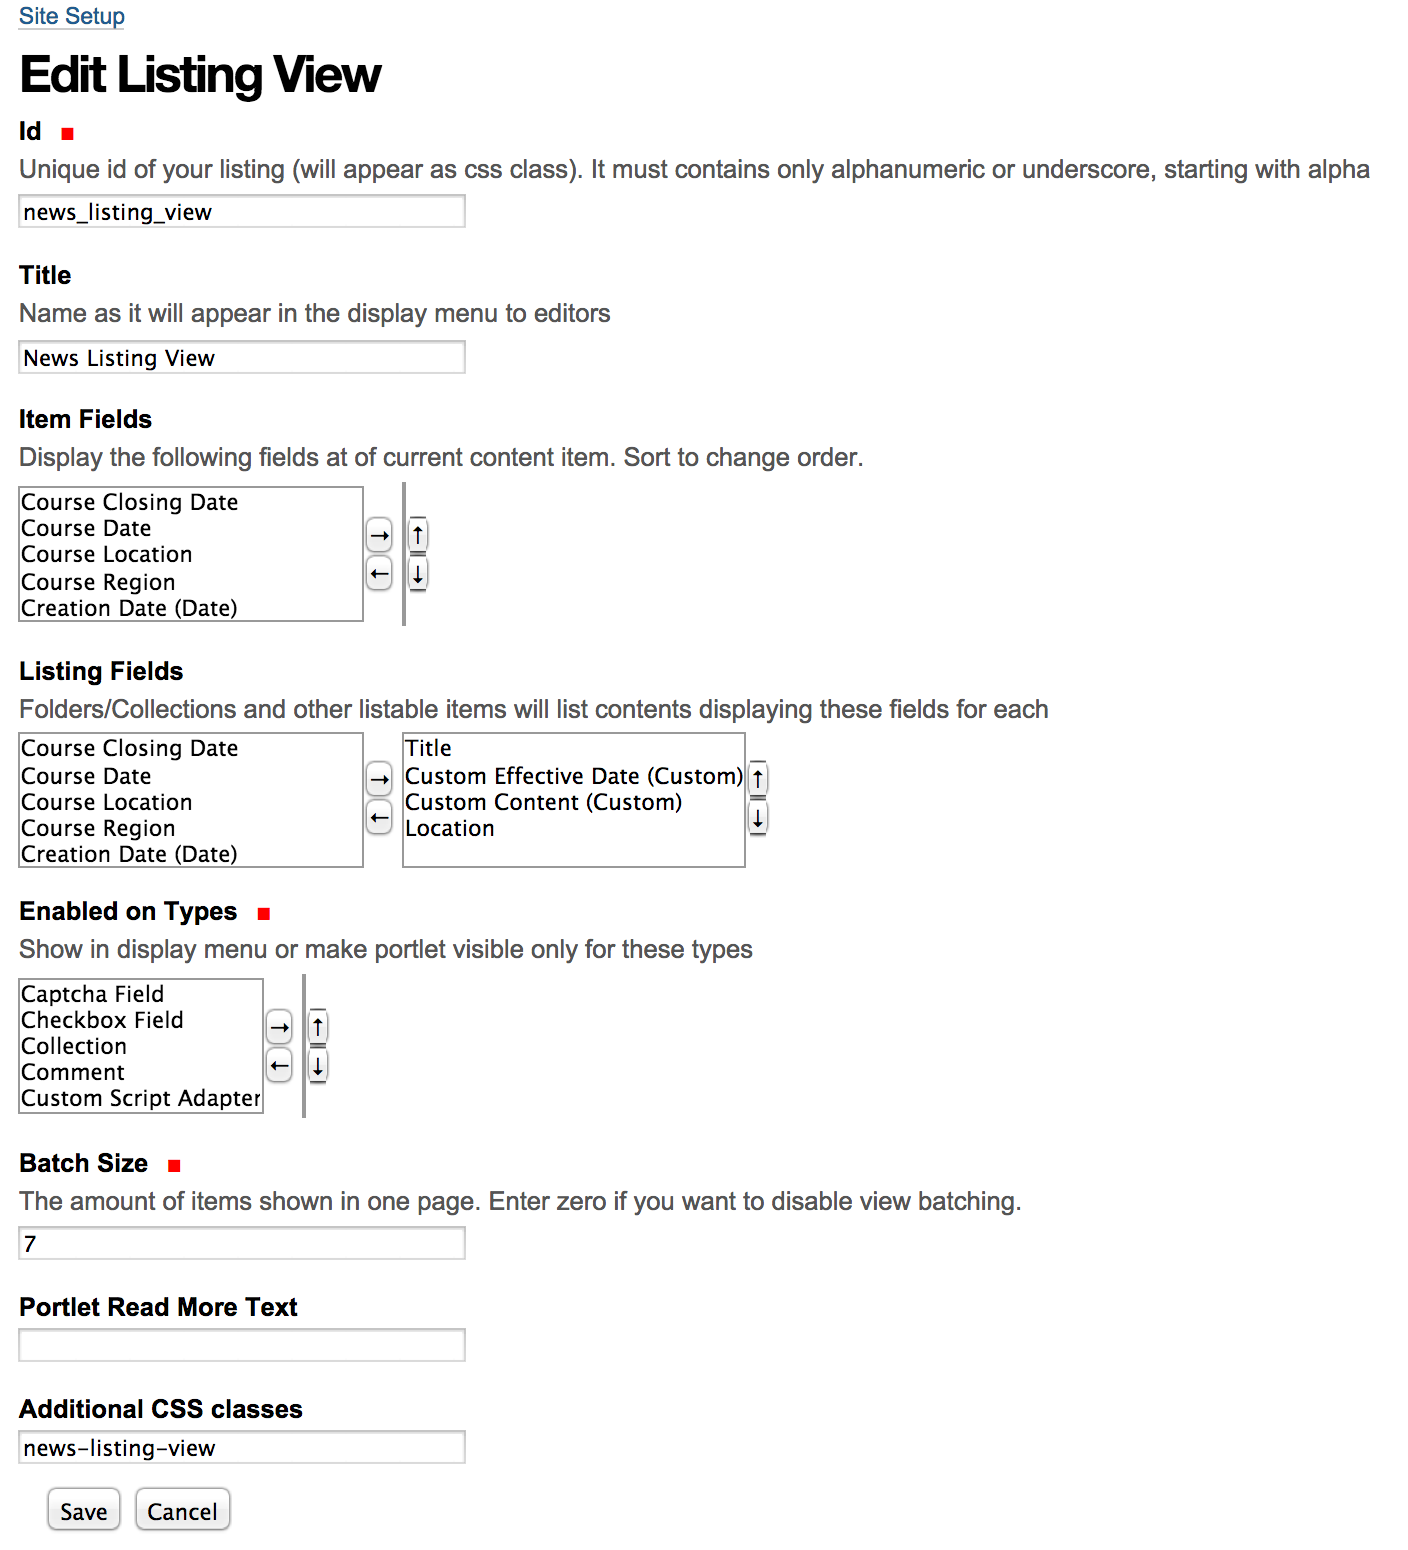 edit listing view